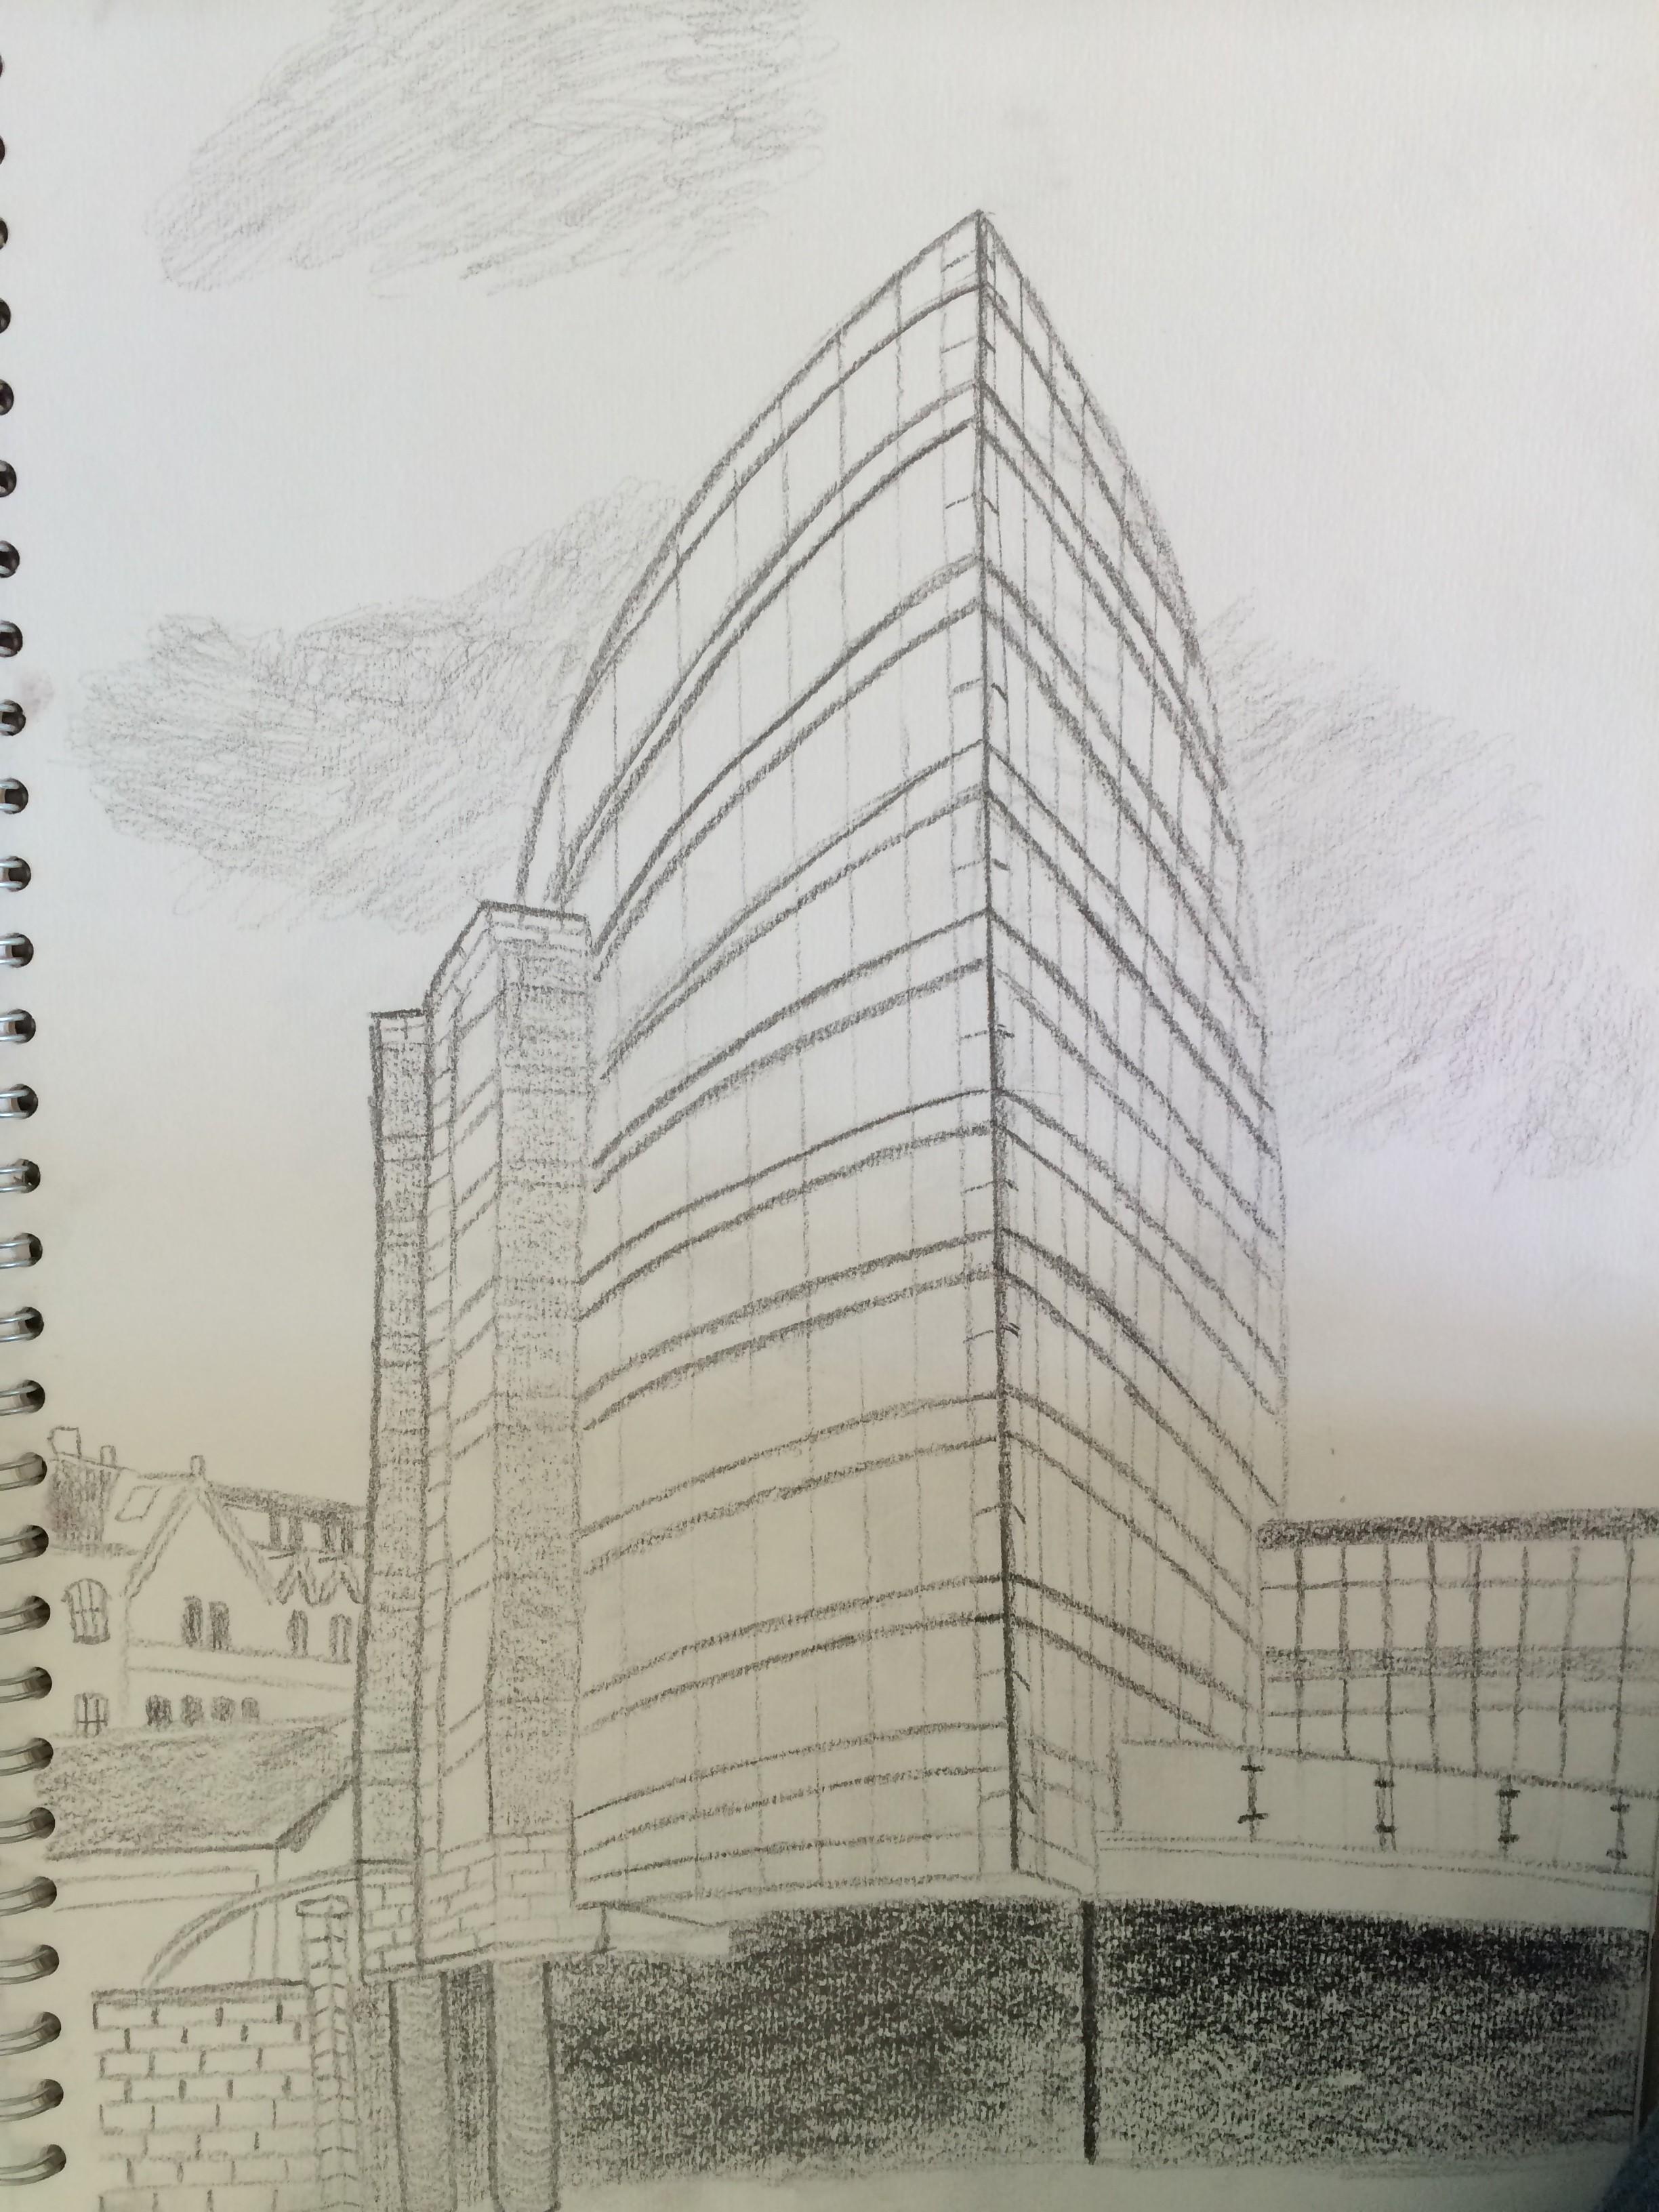 Drawn bulding  tall building Drawn is Observational tall Gatehaus